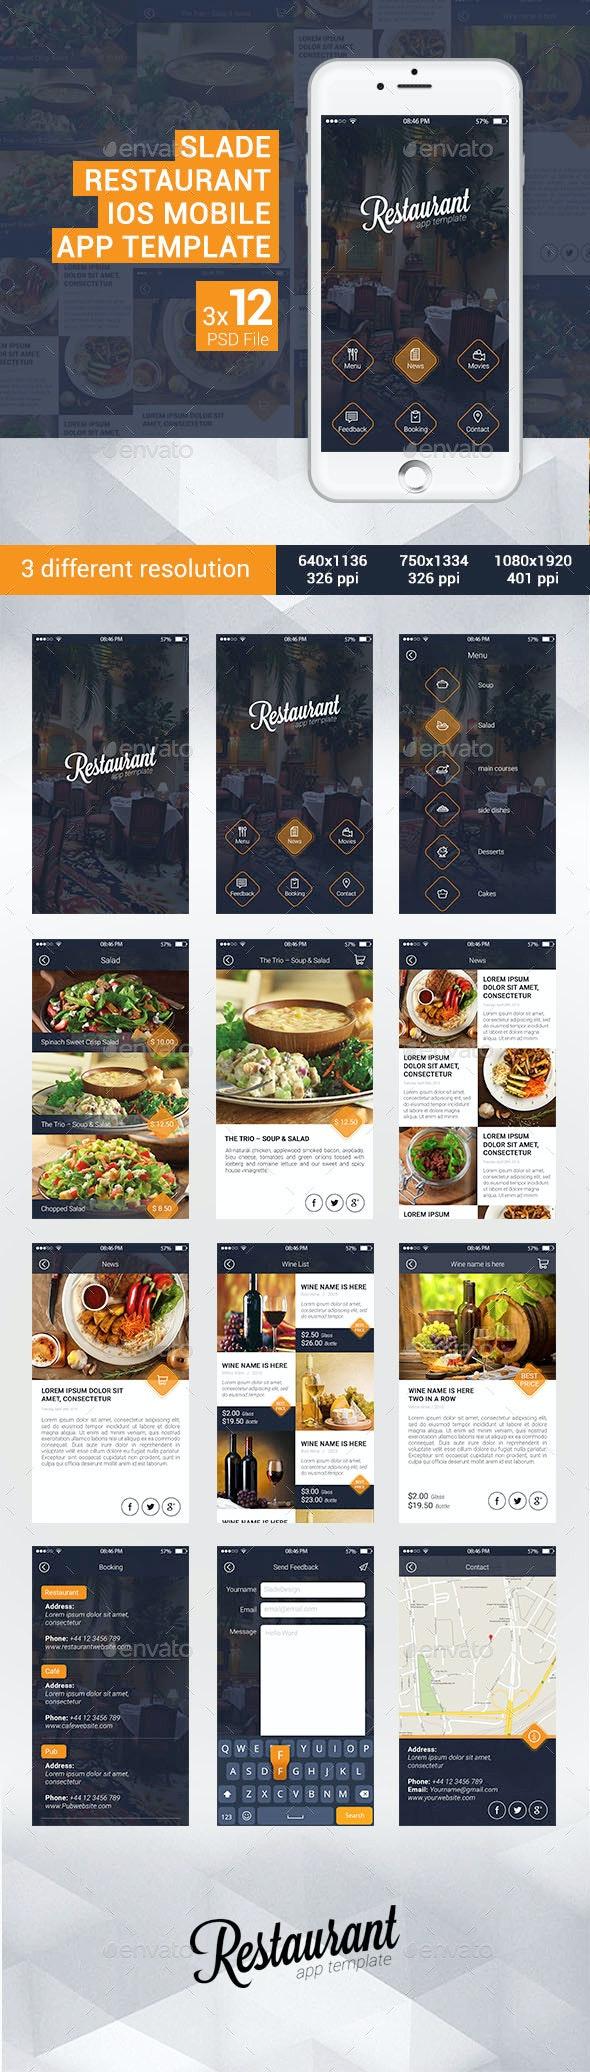 Slade Restaurant iOS Mobile App Template - User Interfaces Web Elements